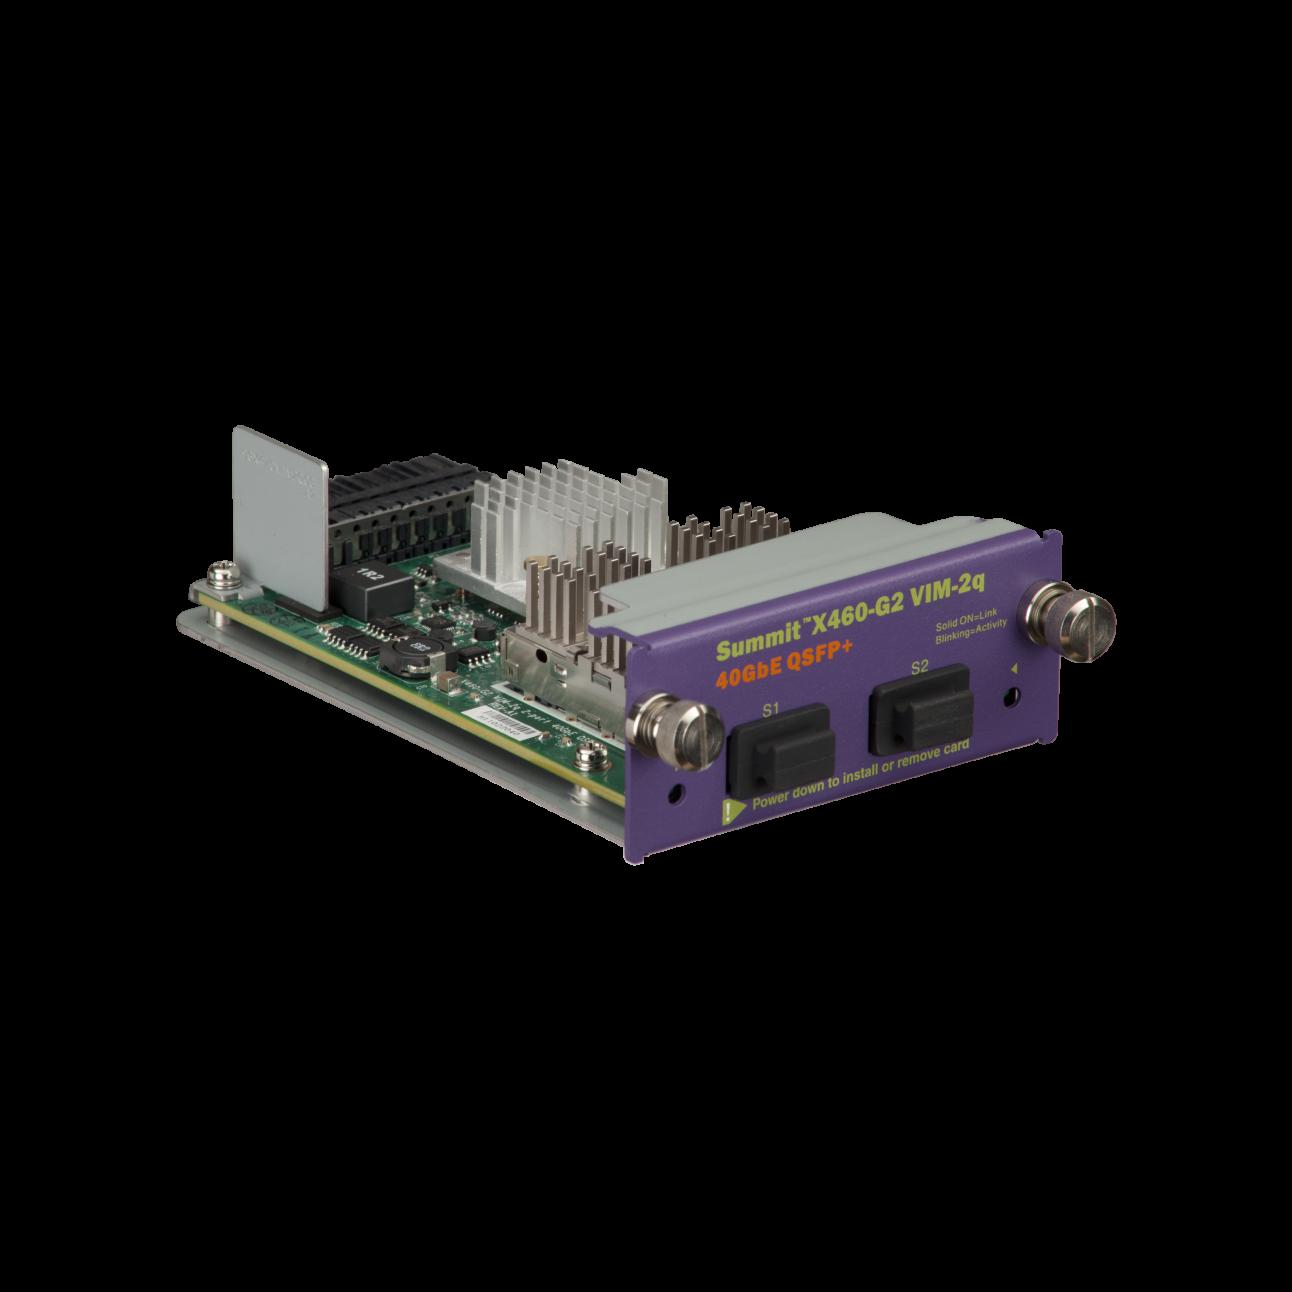 Модуль для коммутаторов Extreme Summit  X460-G2 VIM-2q